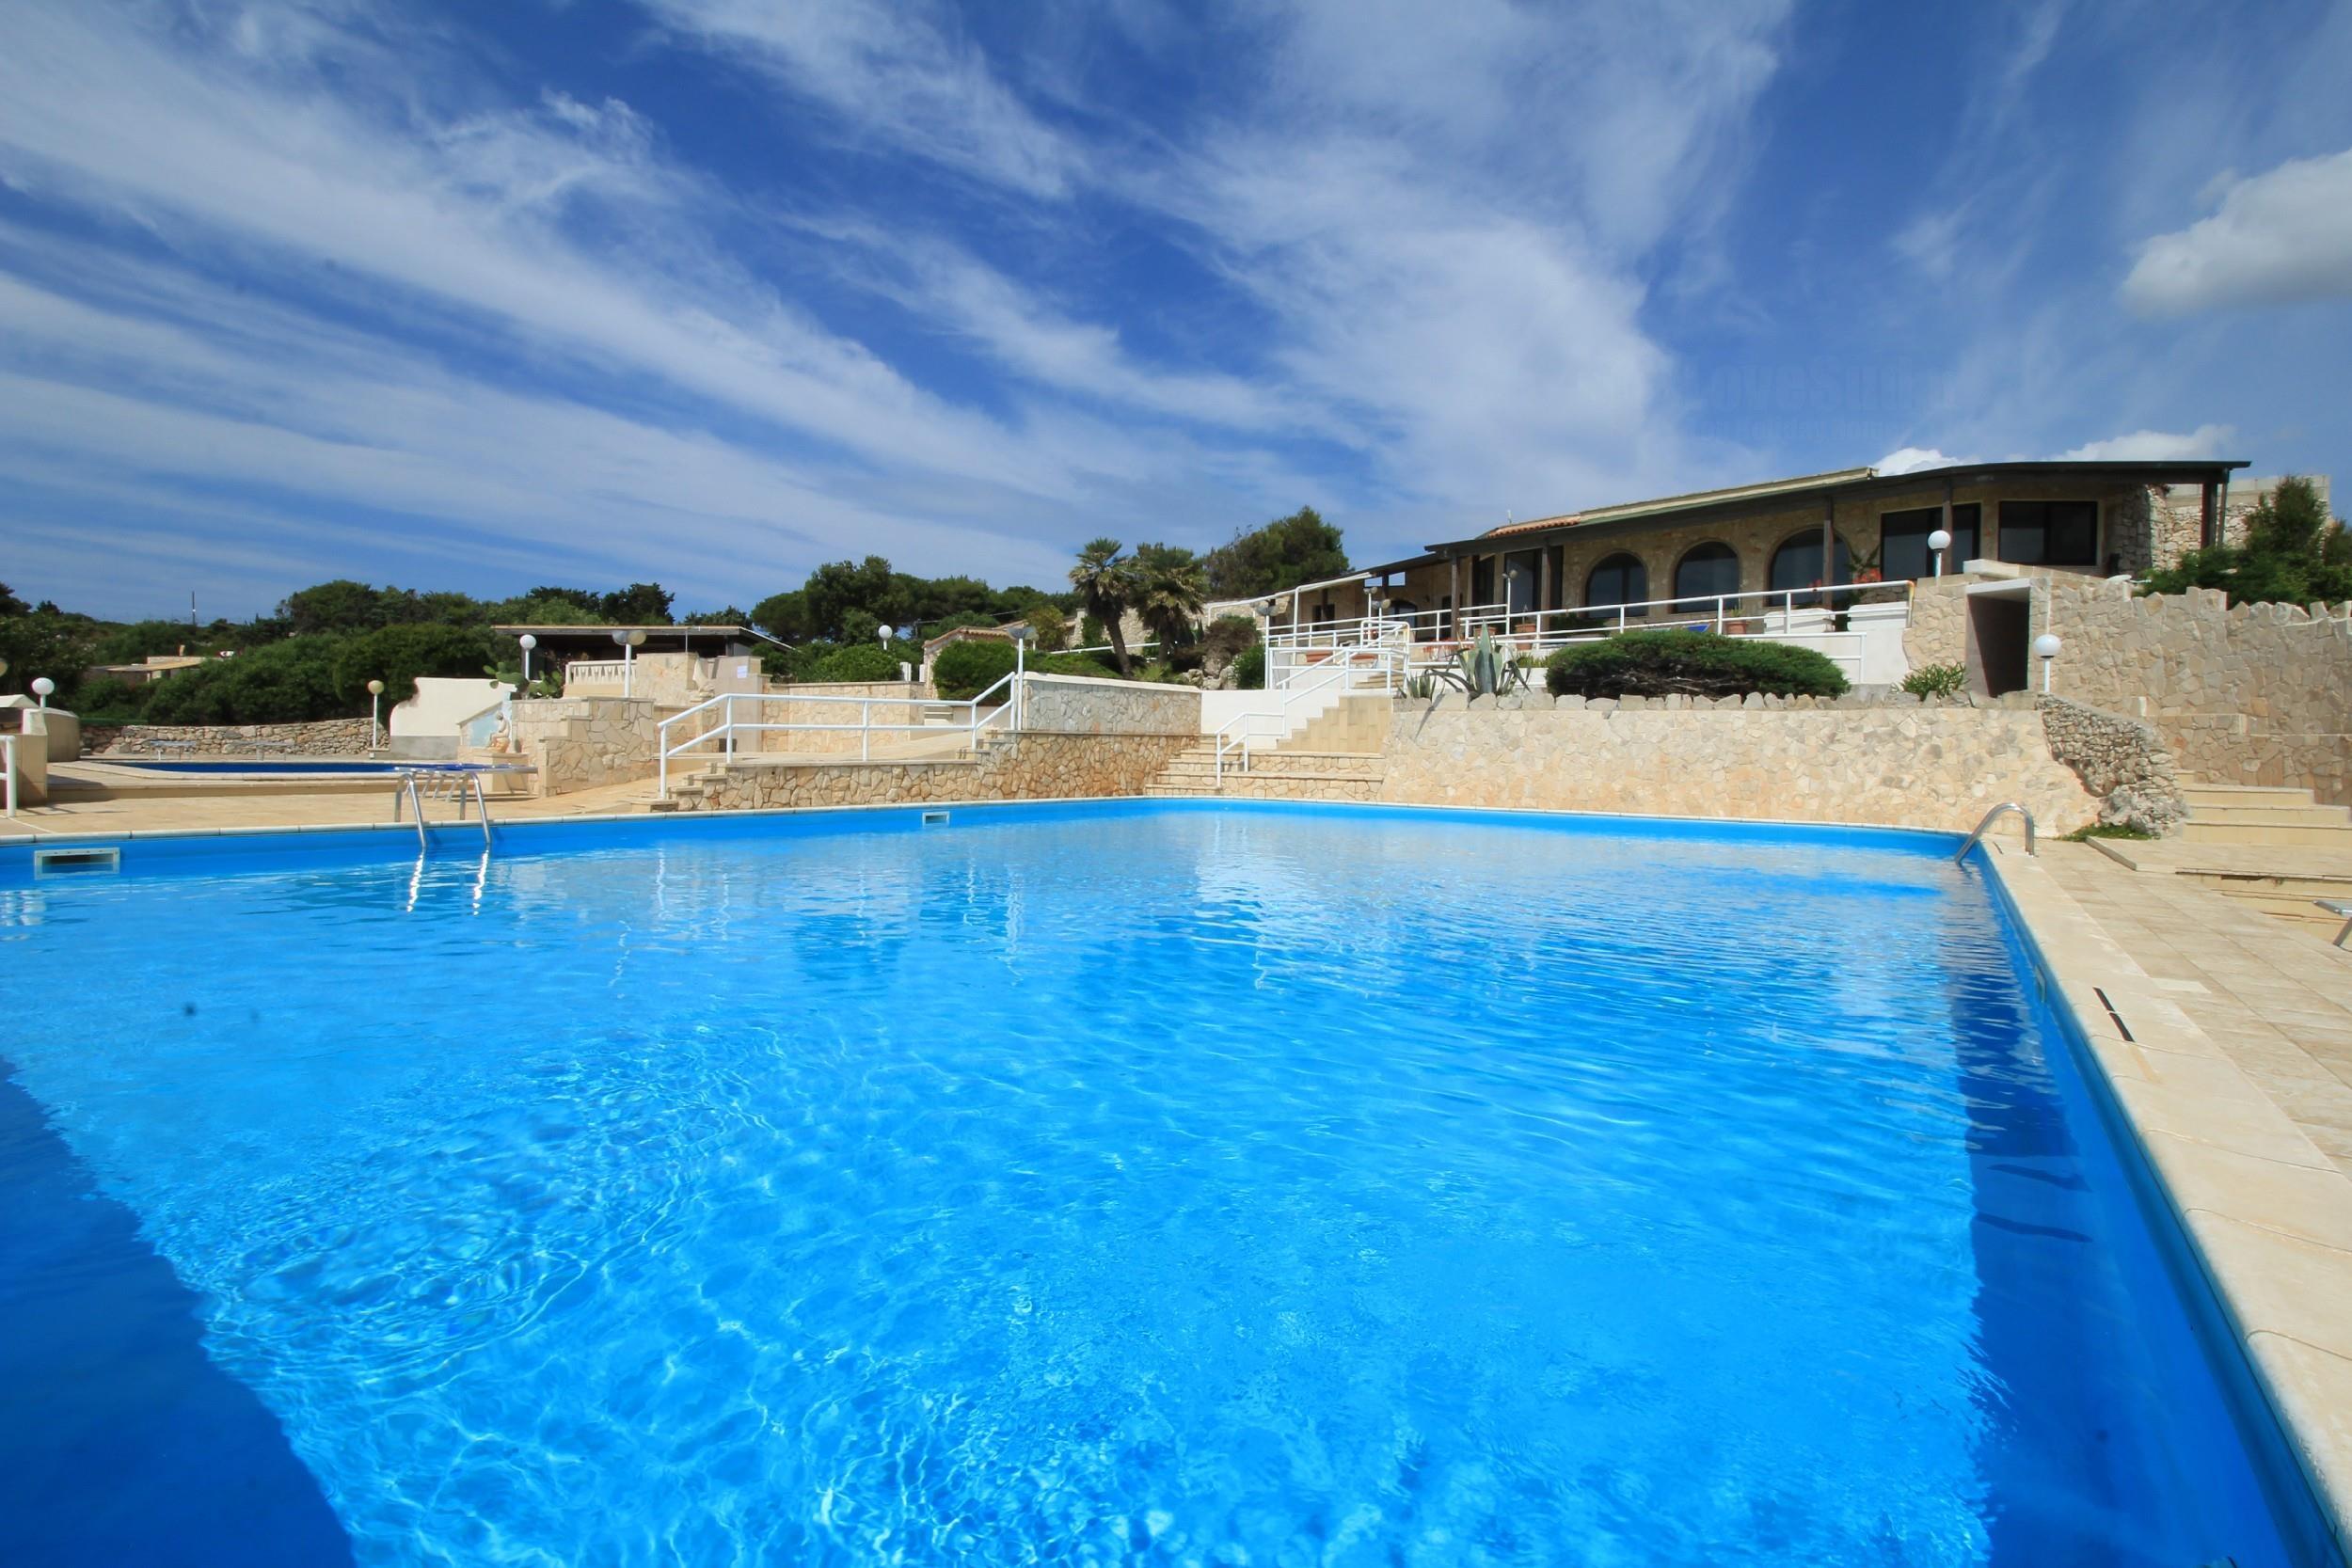 Archetti pool residence photo 22460060